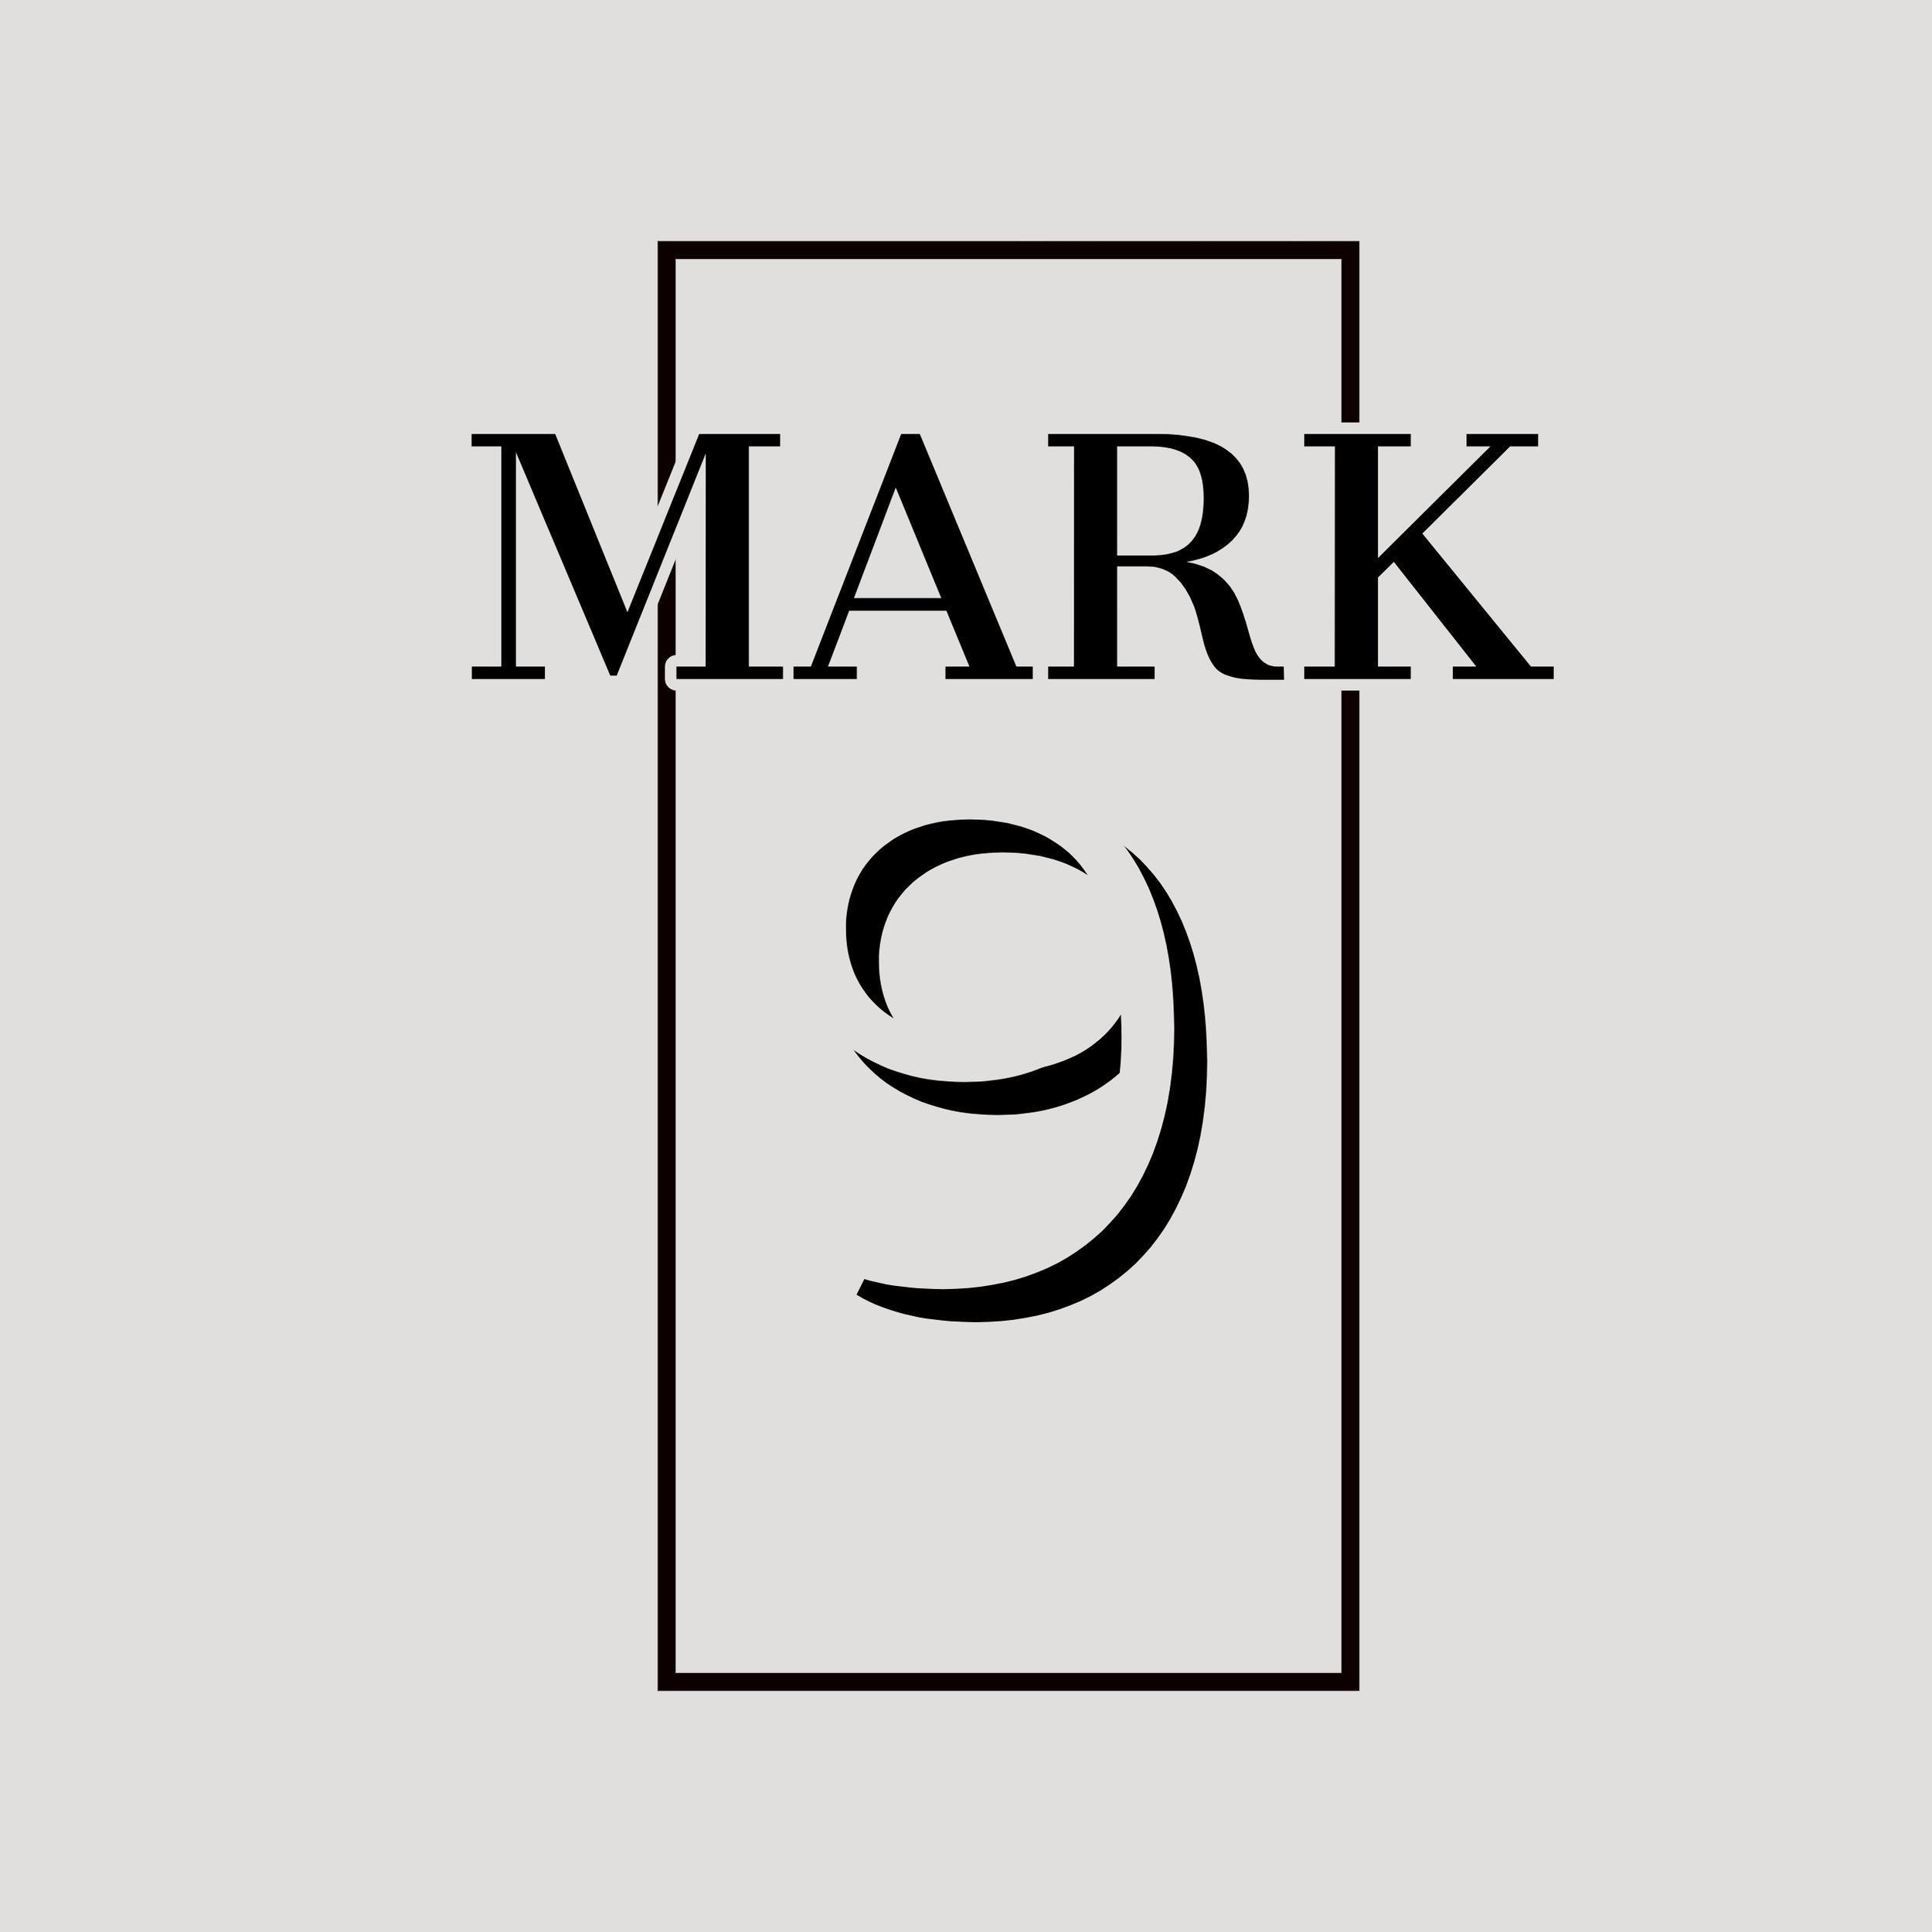 Mark 9.jpg